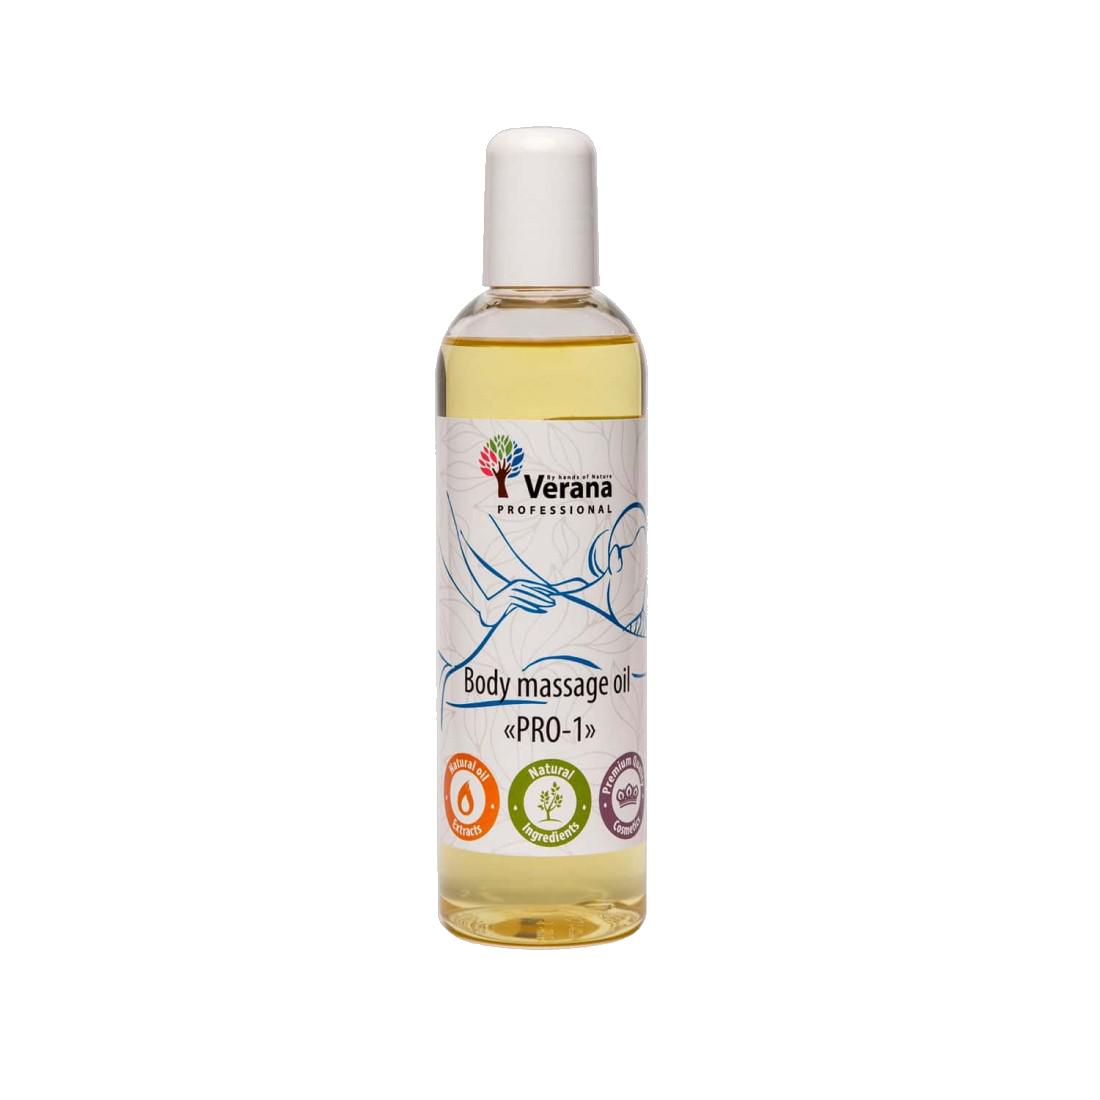 Pro-1 massage olie verana